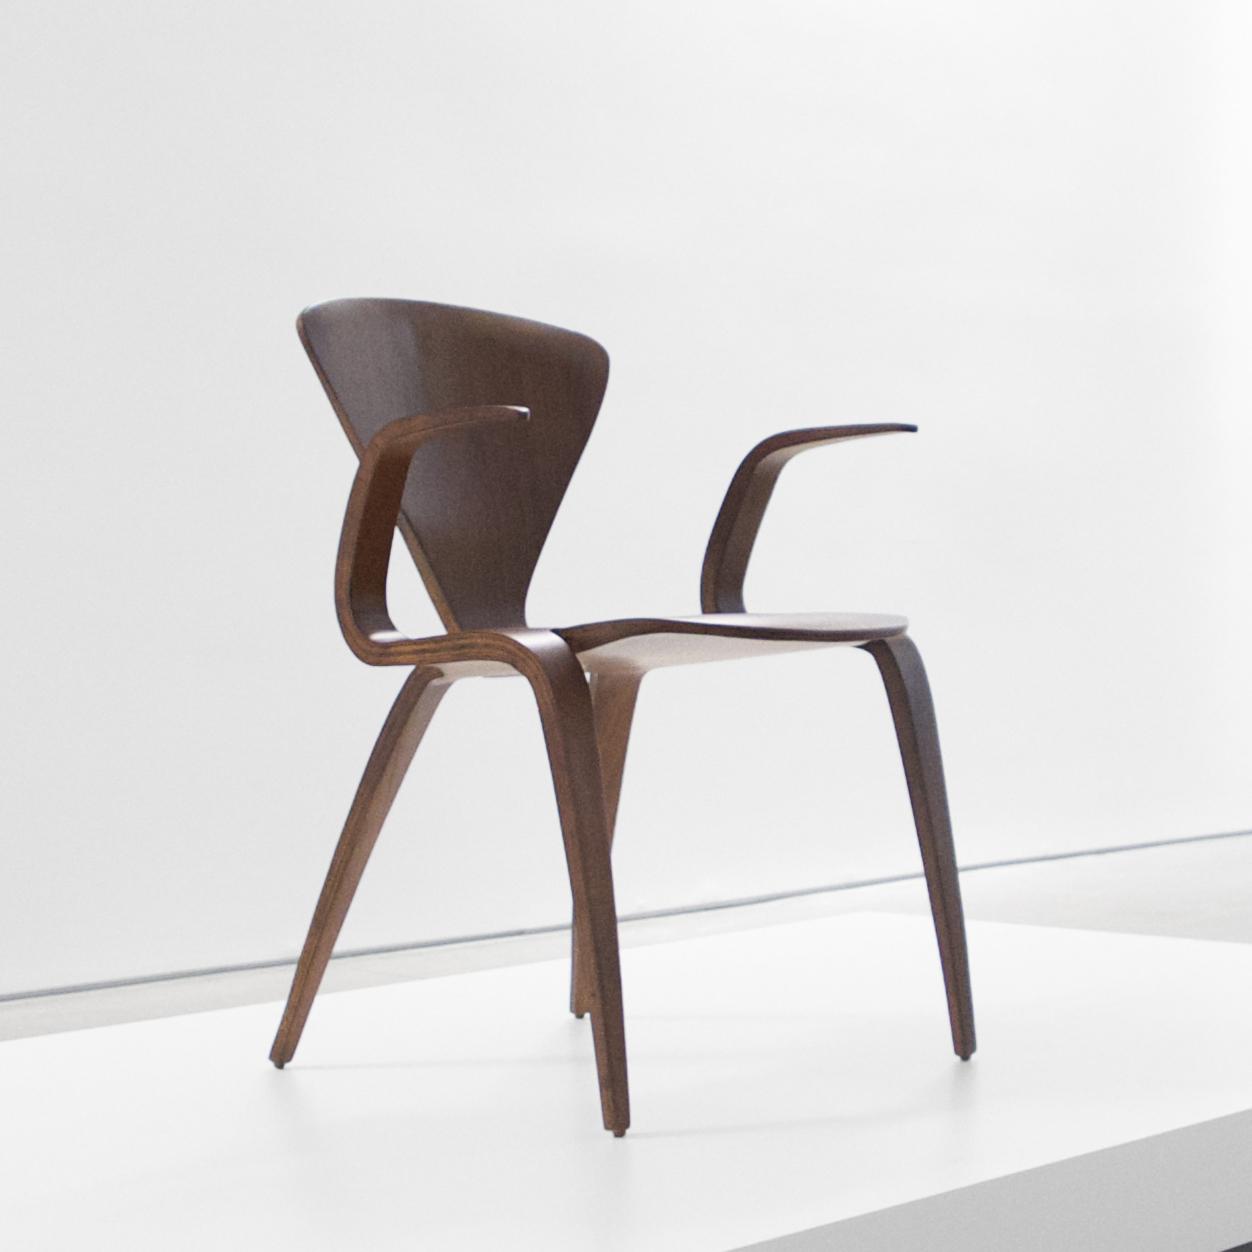 norman cherner  rare prototype armchair for plycraft  c. 1960 - 1969 ...